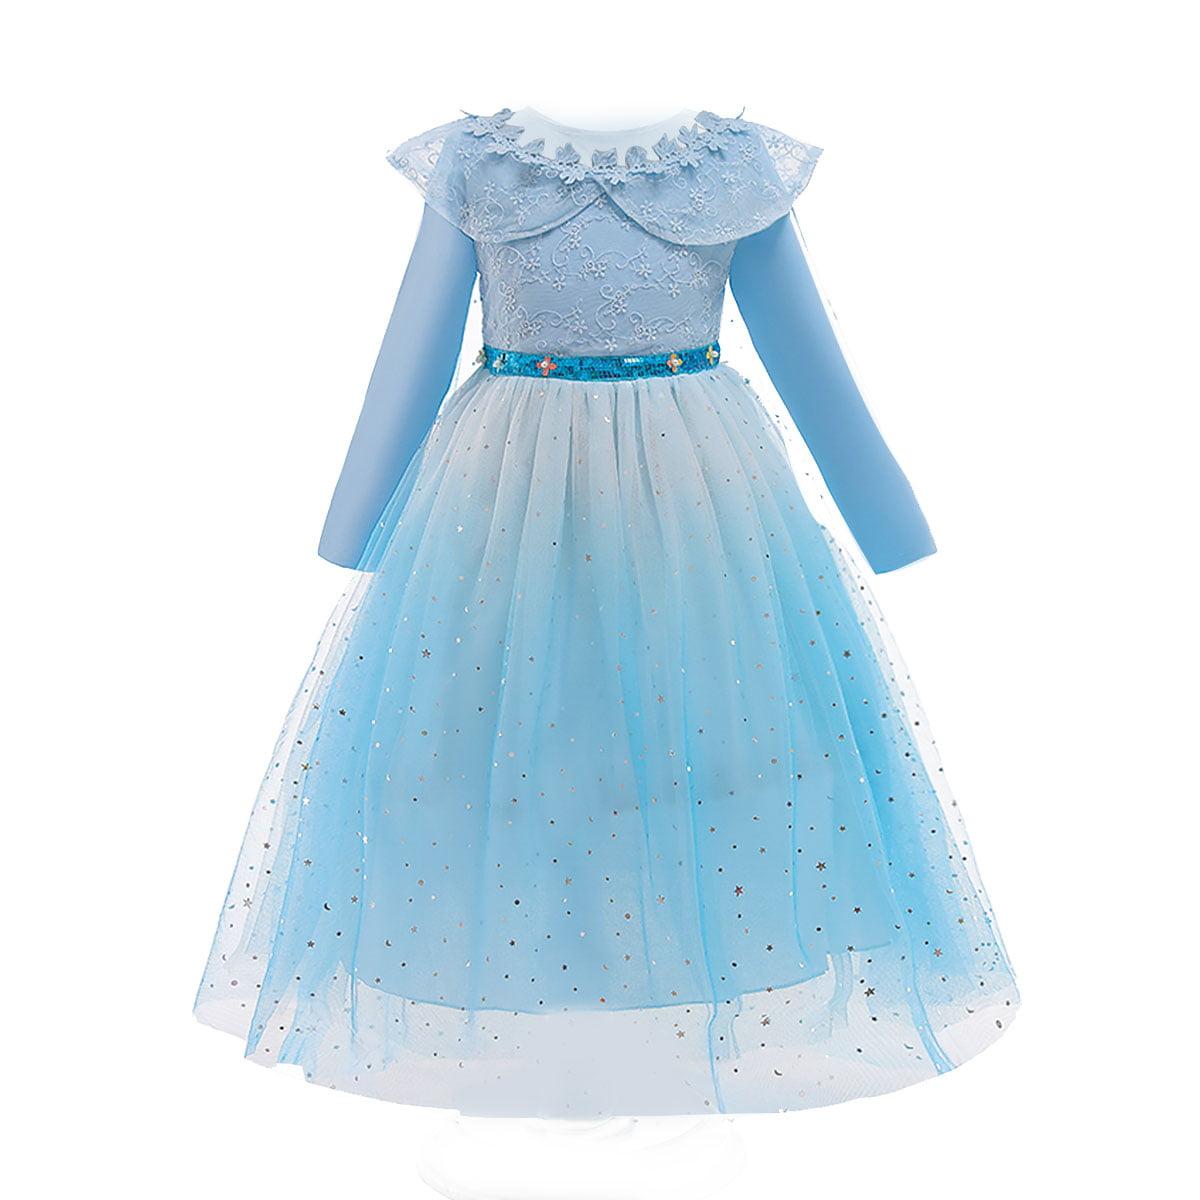 Details about  /Girls Princess Dress Elsa Queen Fancy Sequin Dress Up Costume Party Wedding New